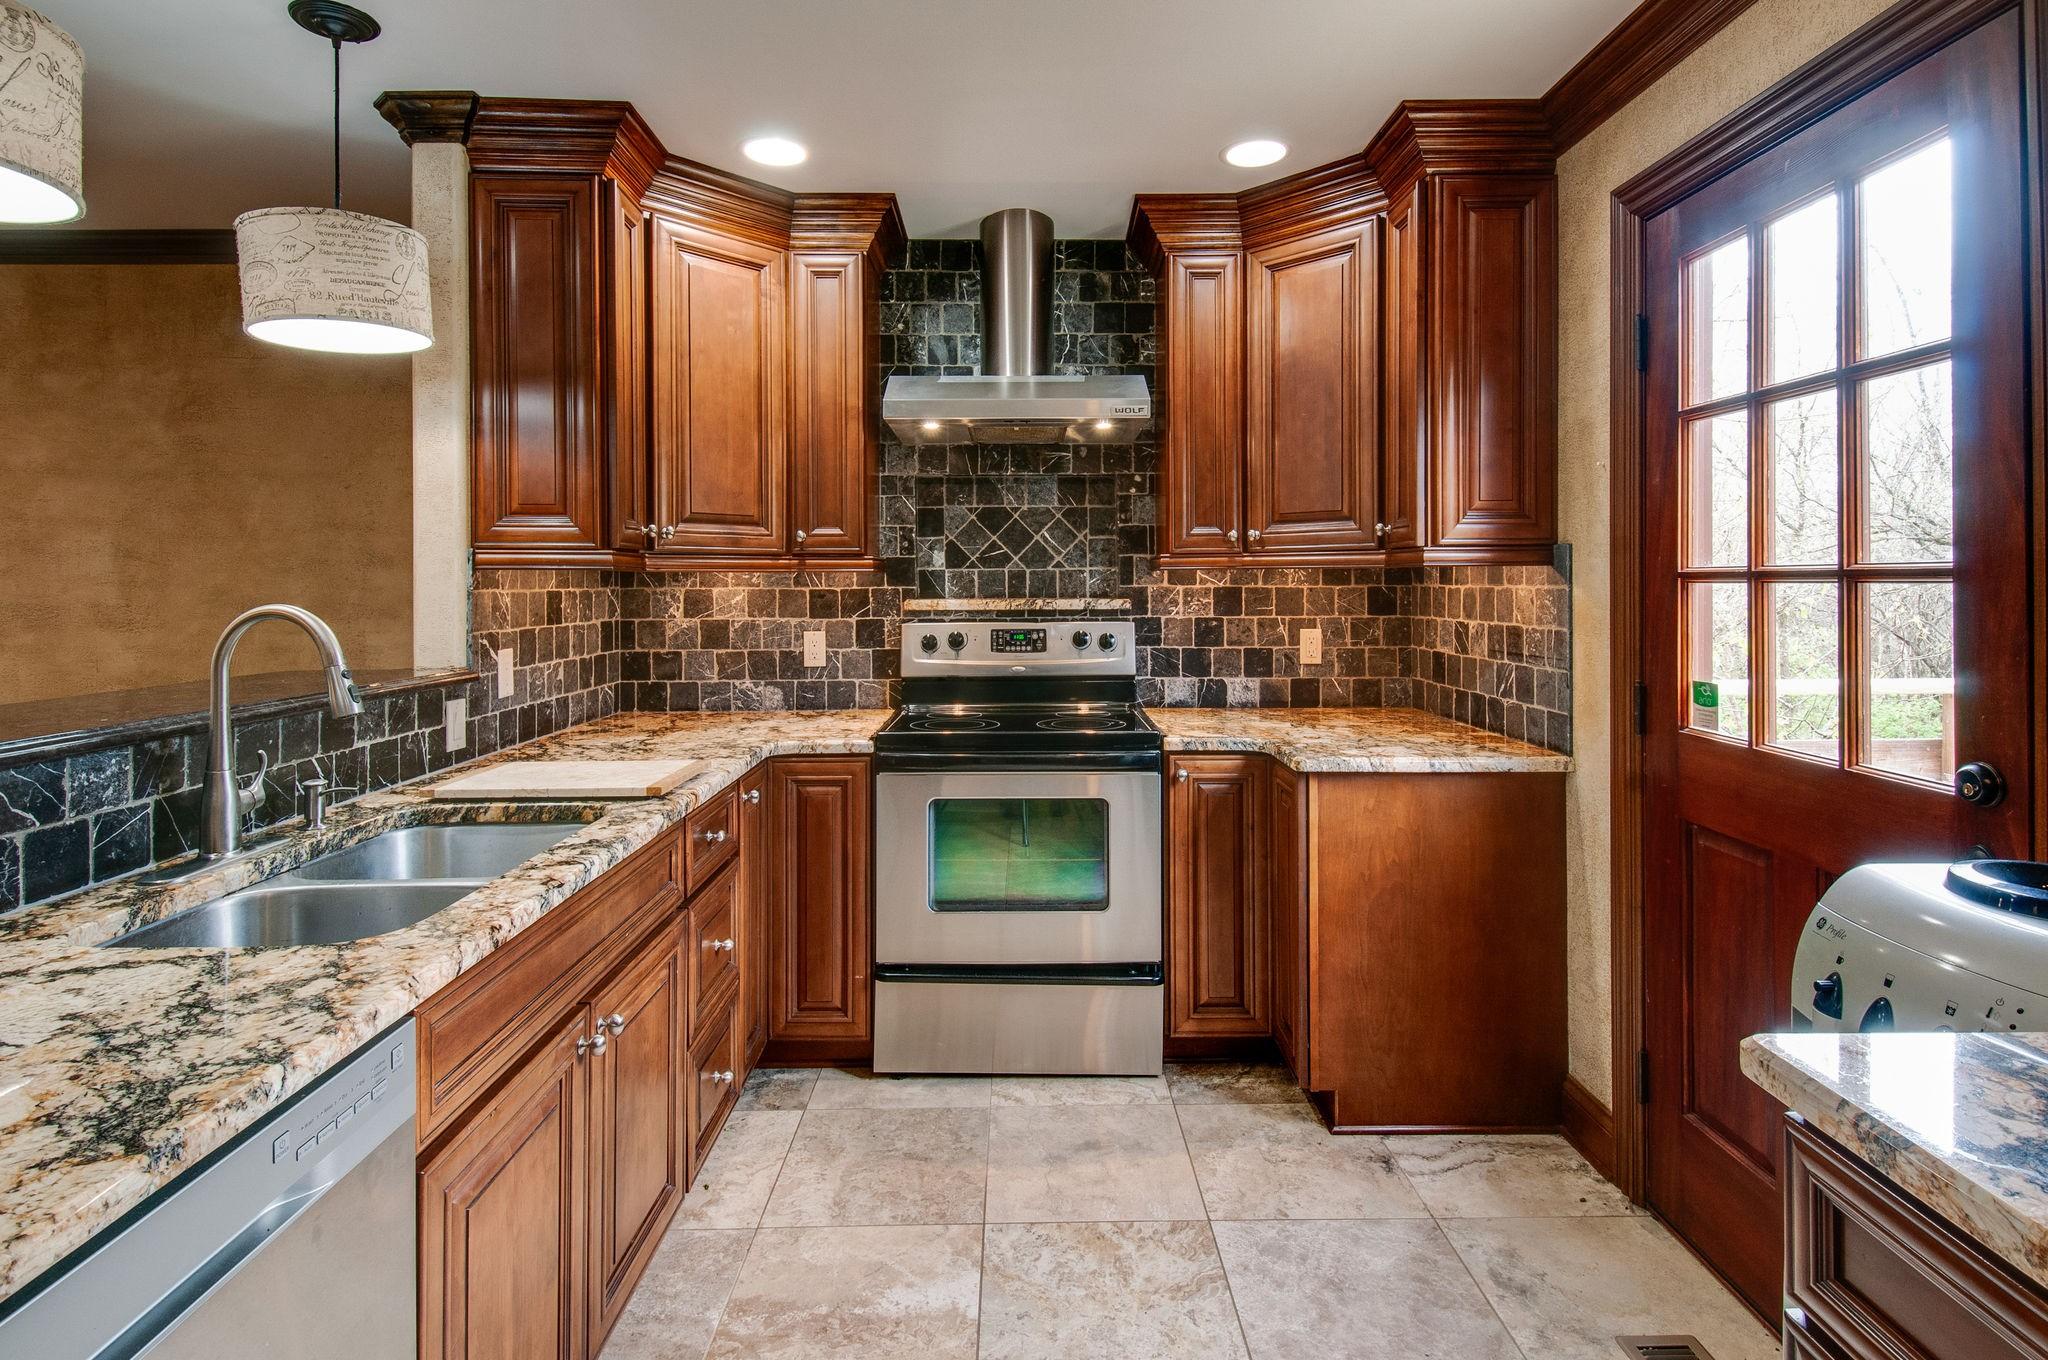 7762 Sawyer Brown Rd, Nashville, TN 37221 - Nashville, TN real estate listing